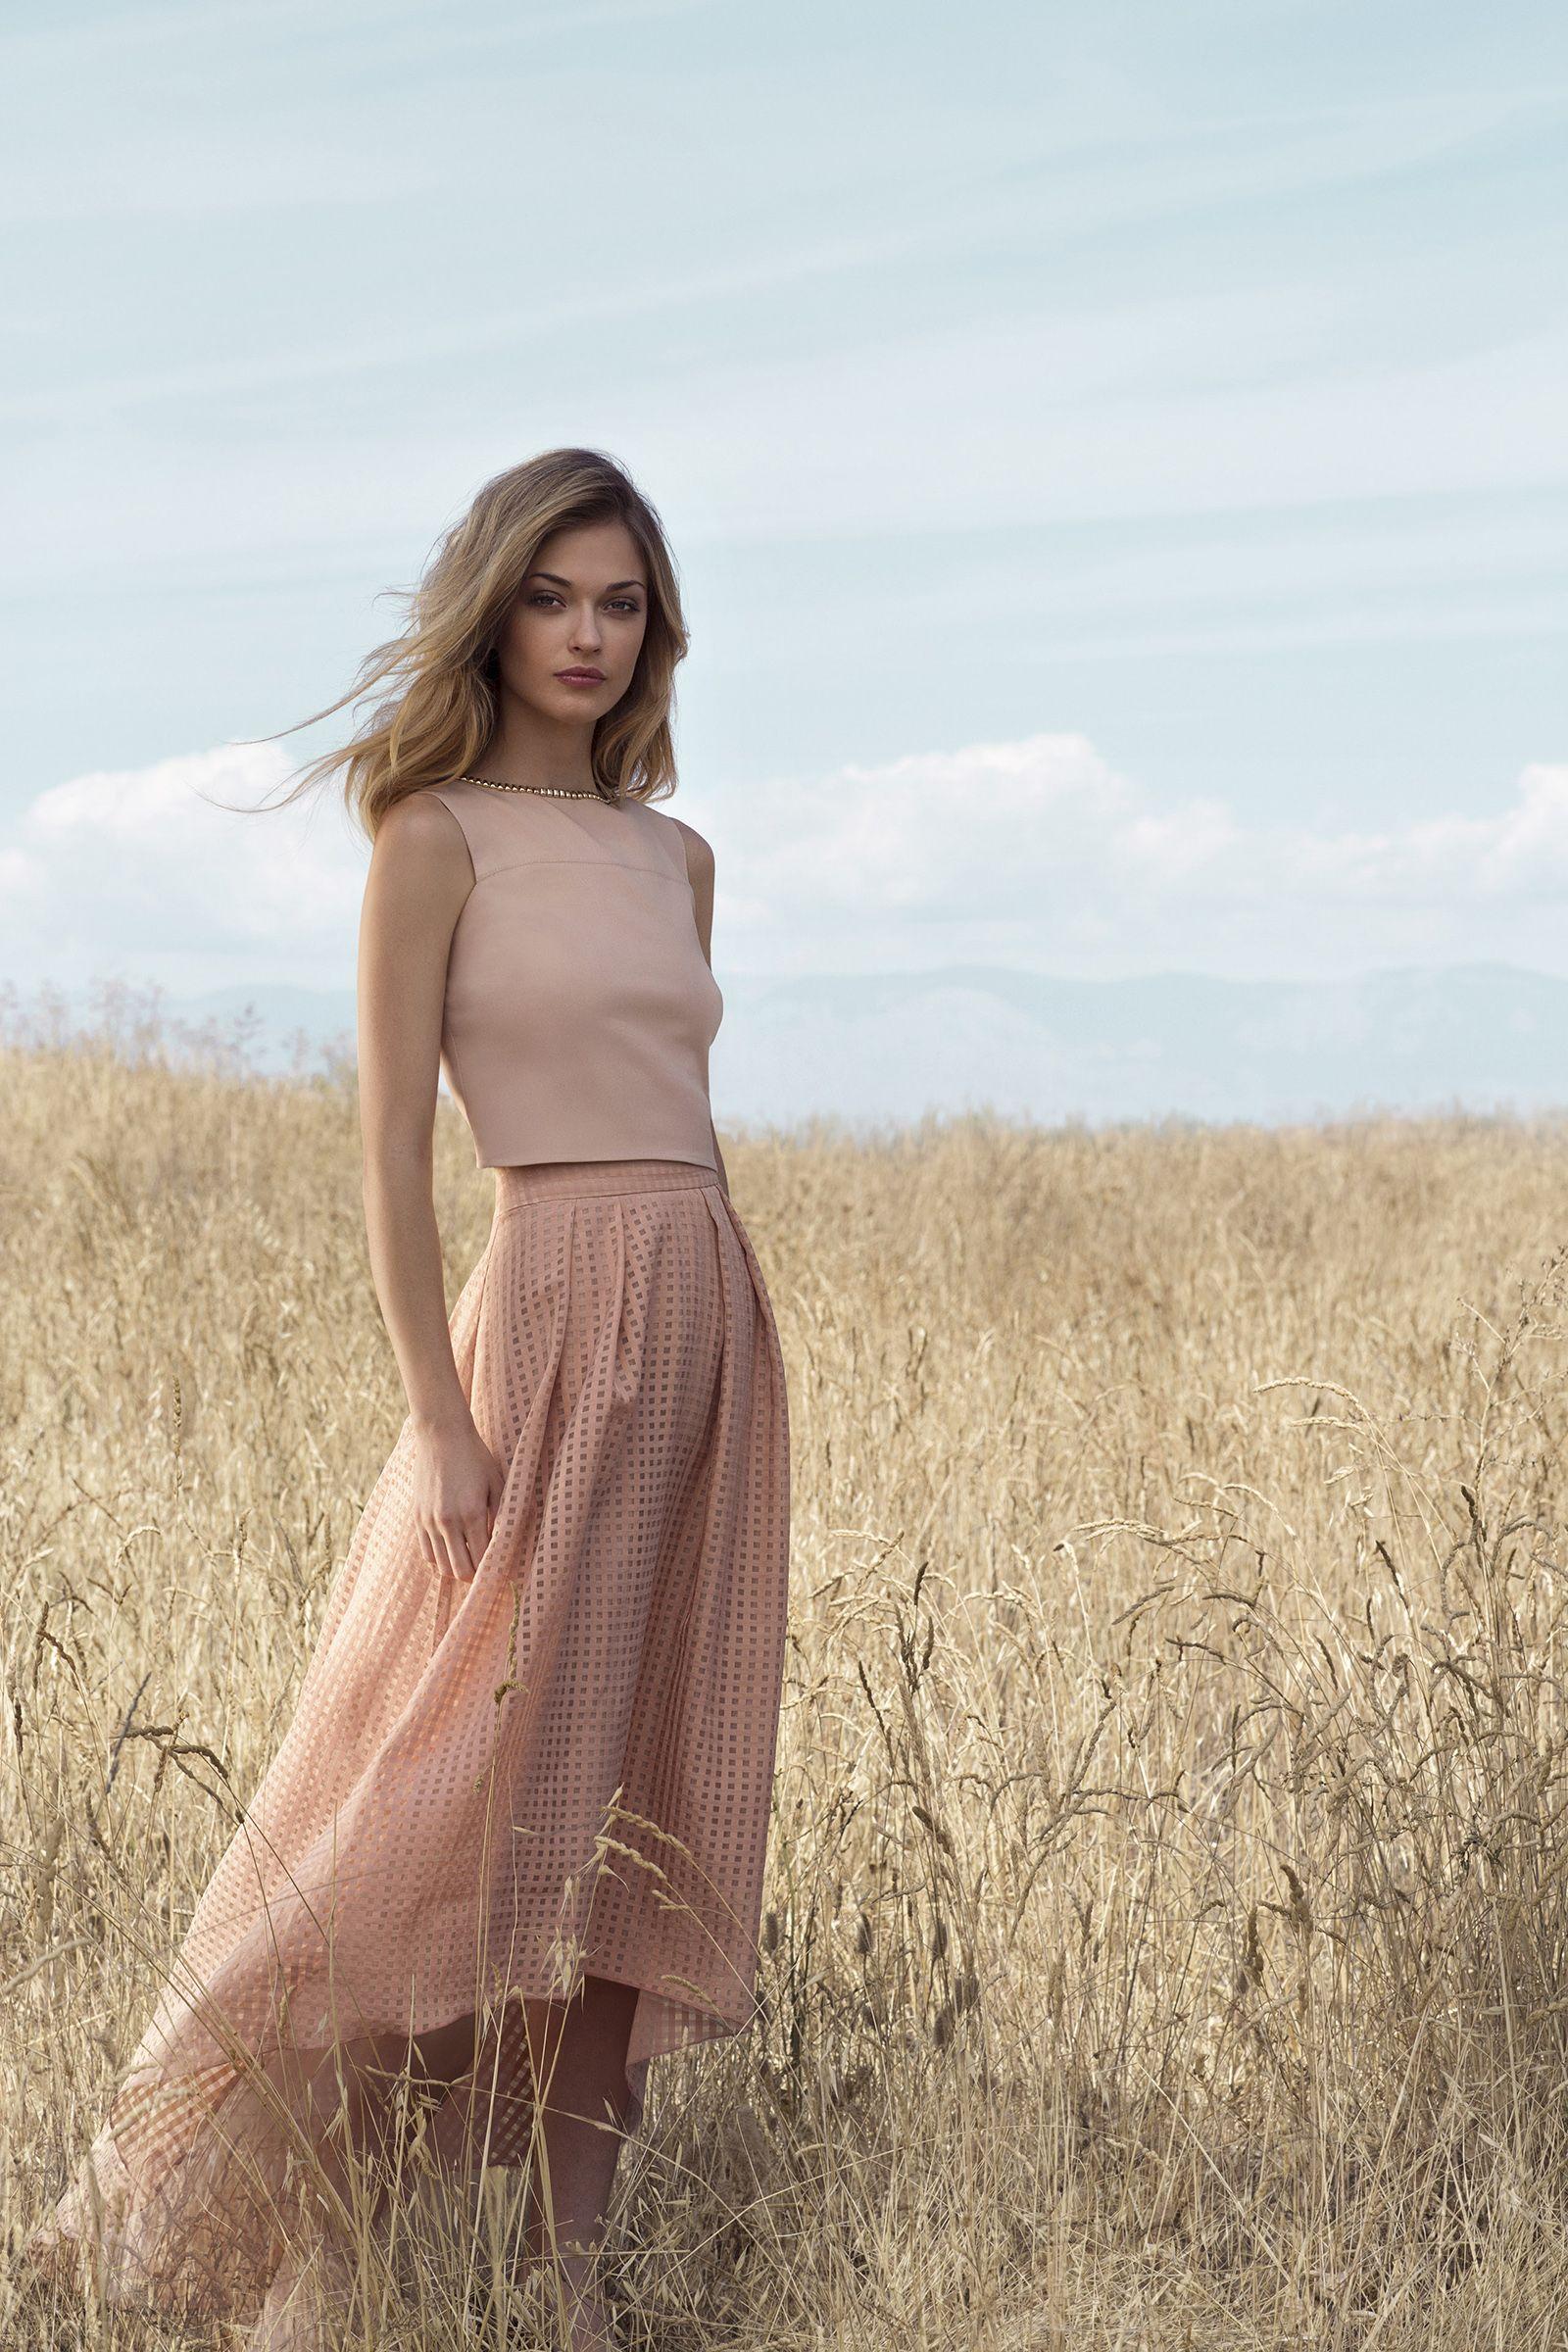 Lookbook - Estalot   www.estalot.com #estalot #fashion #style #rosa #ss16 #primaveraverano2016